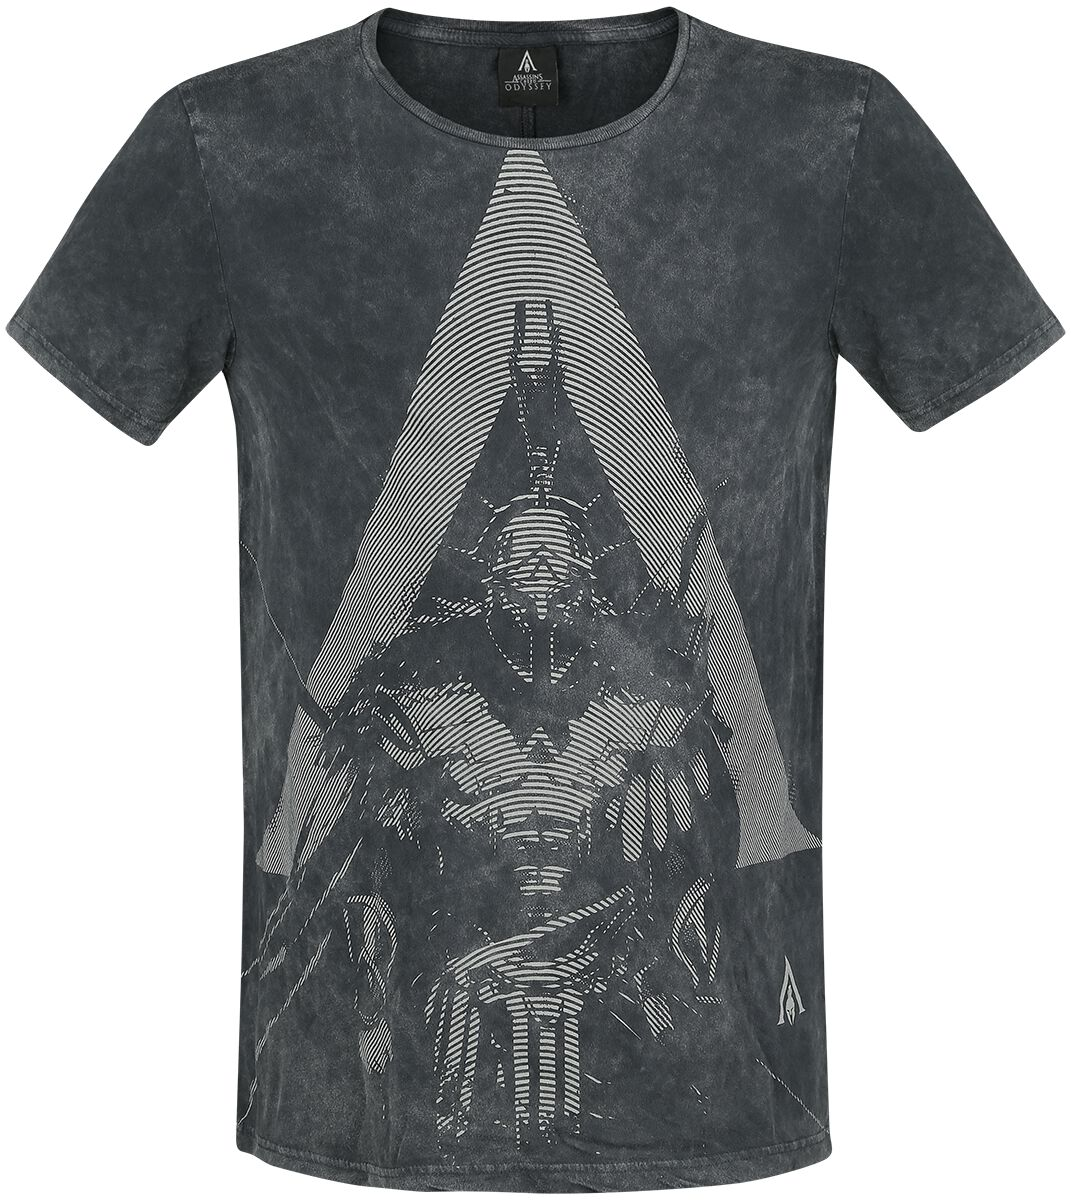 Image of   Assassin's Creed Odyssey - Hoplite T-Shirt sort